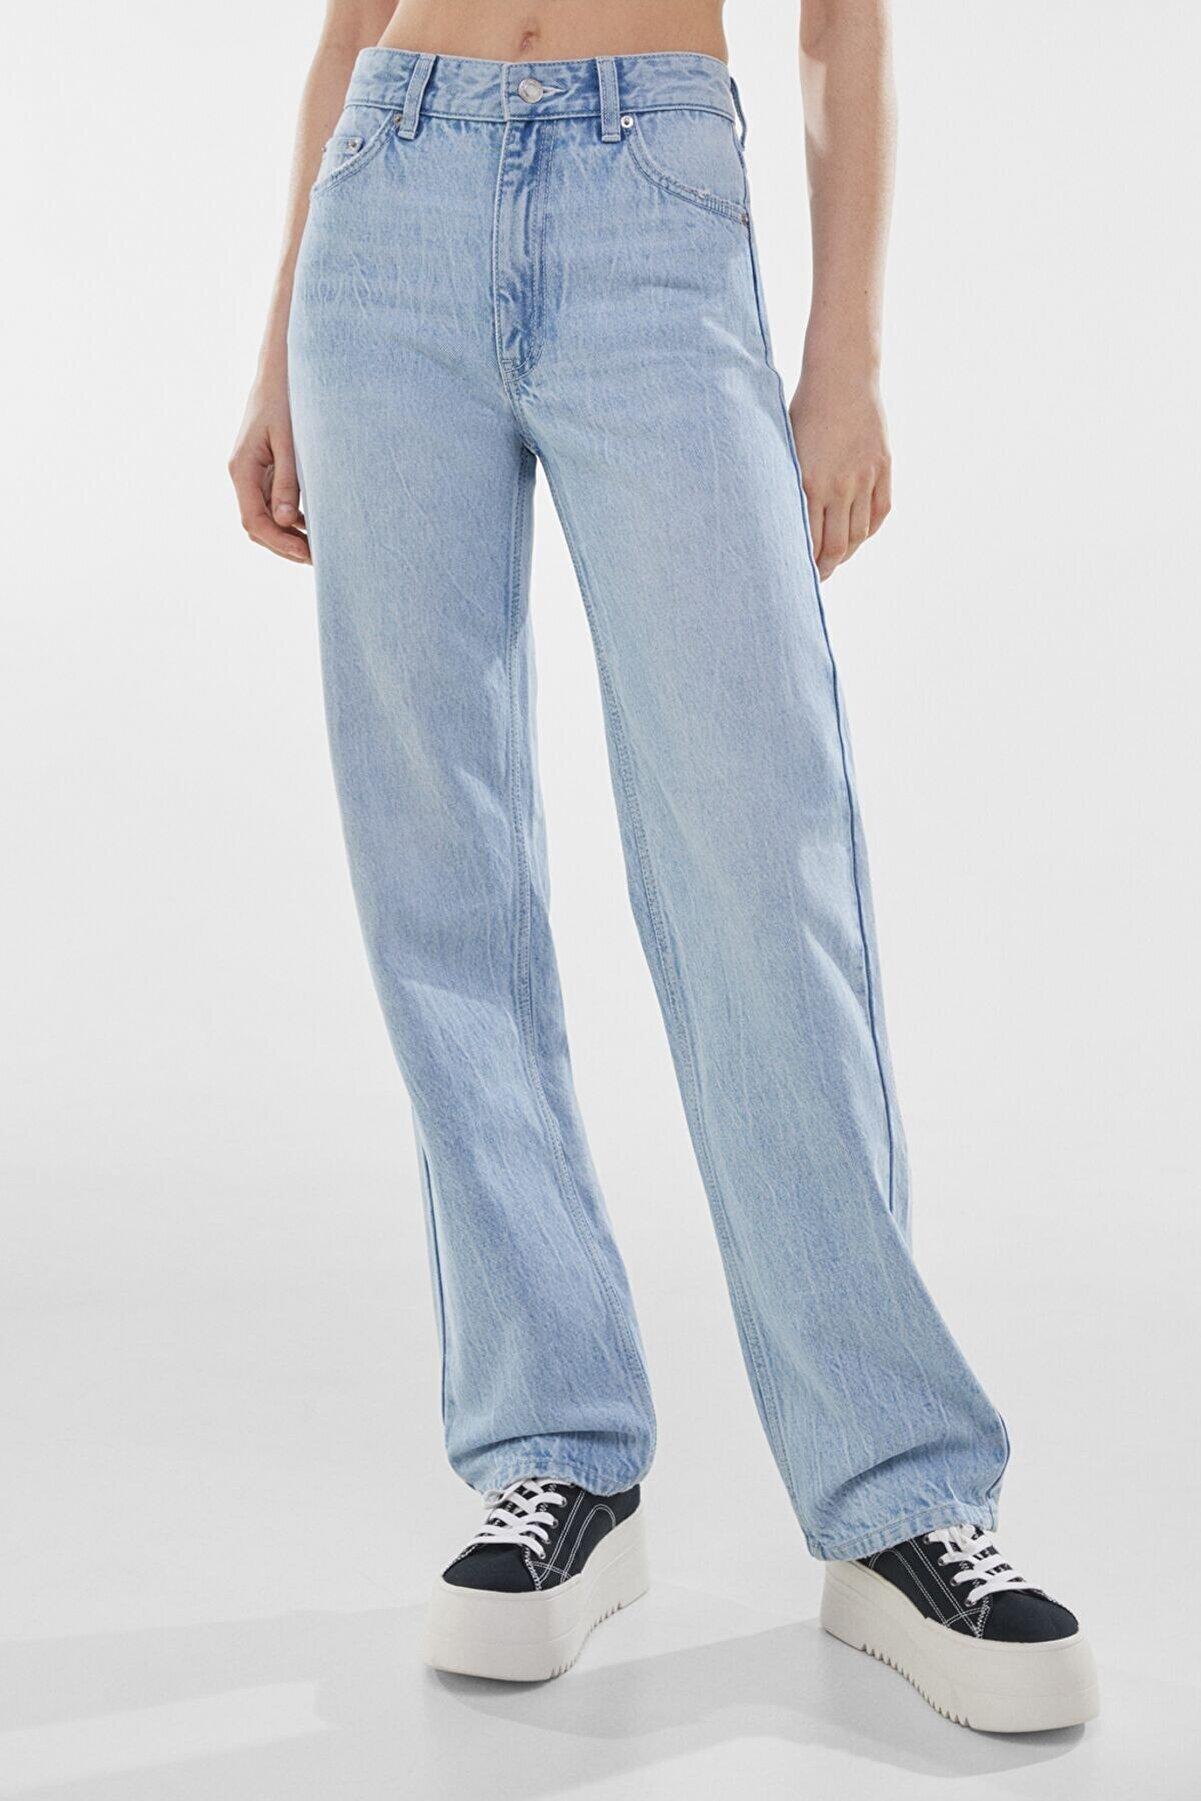 Bershka Kadın Lacivert Straight Fit Yüksek Bel Jean